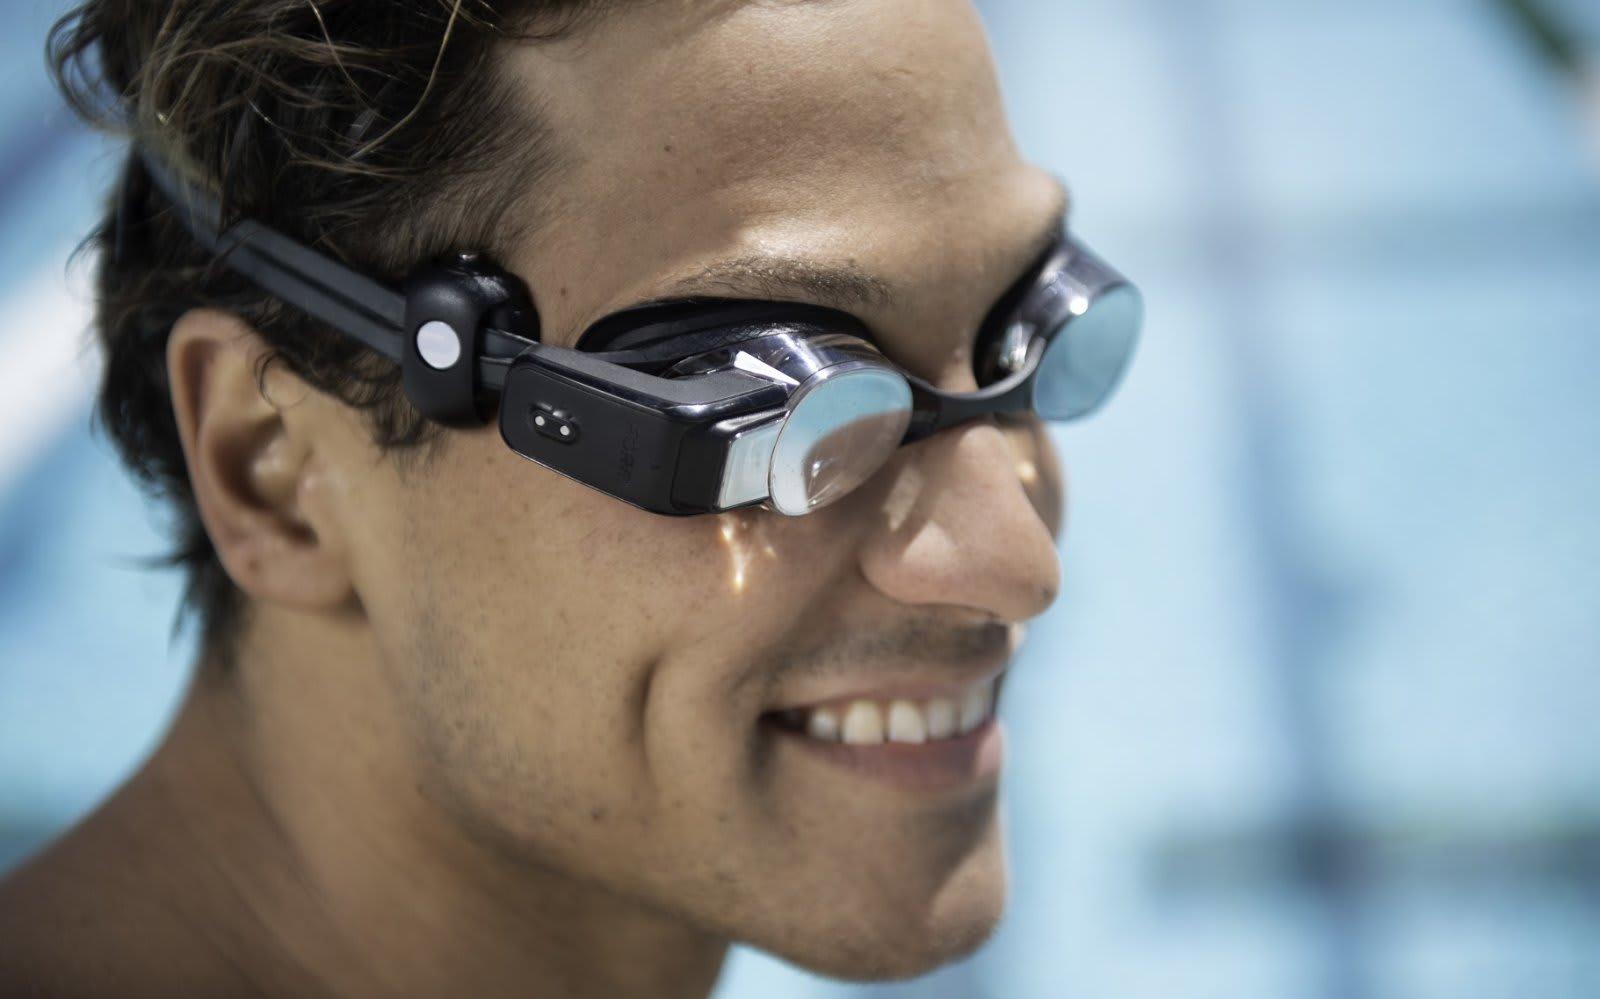 Formの水泳用ARゴーグルに心拍数表示機能が追加。Polar OH1/OH1+と連携可能に